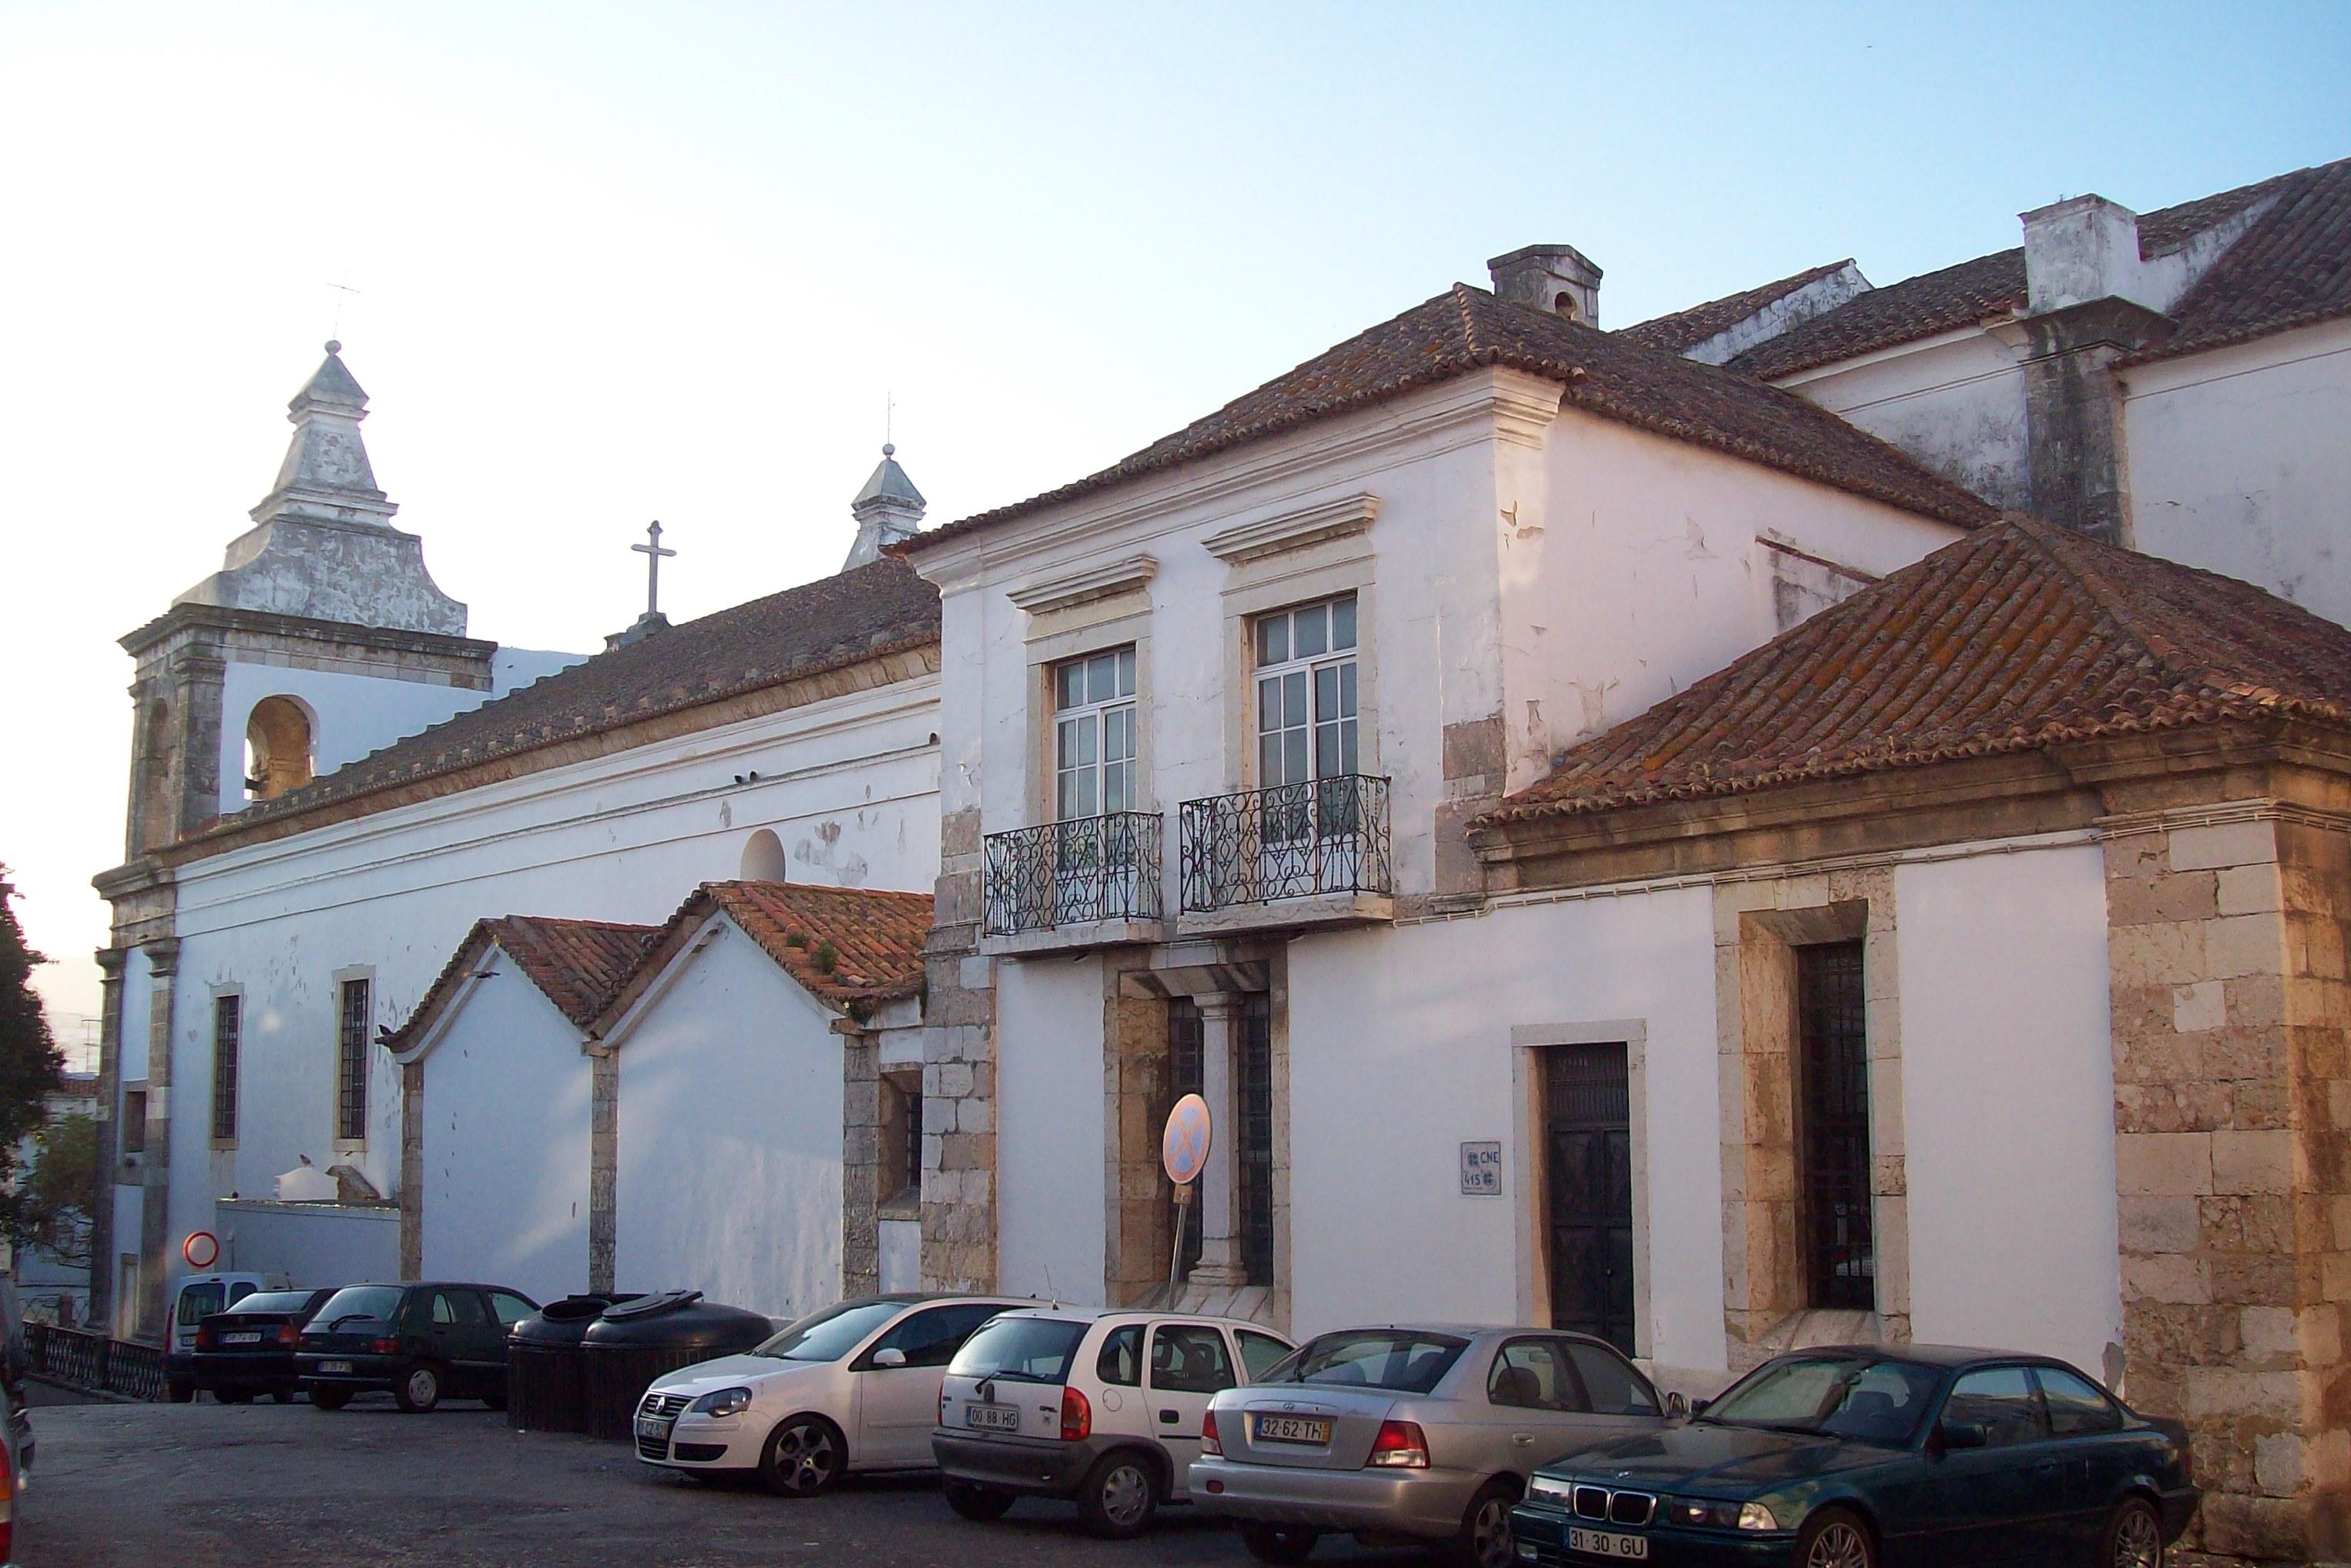 Se Catedral de Santa Maria da Graca